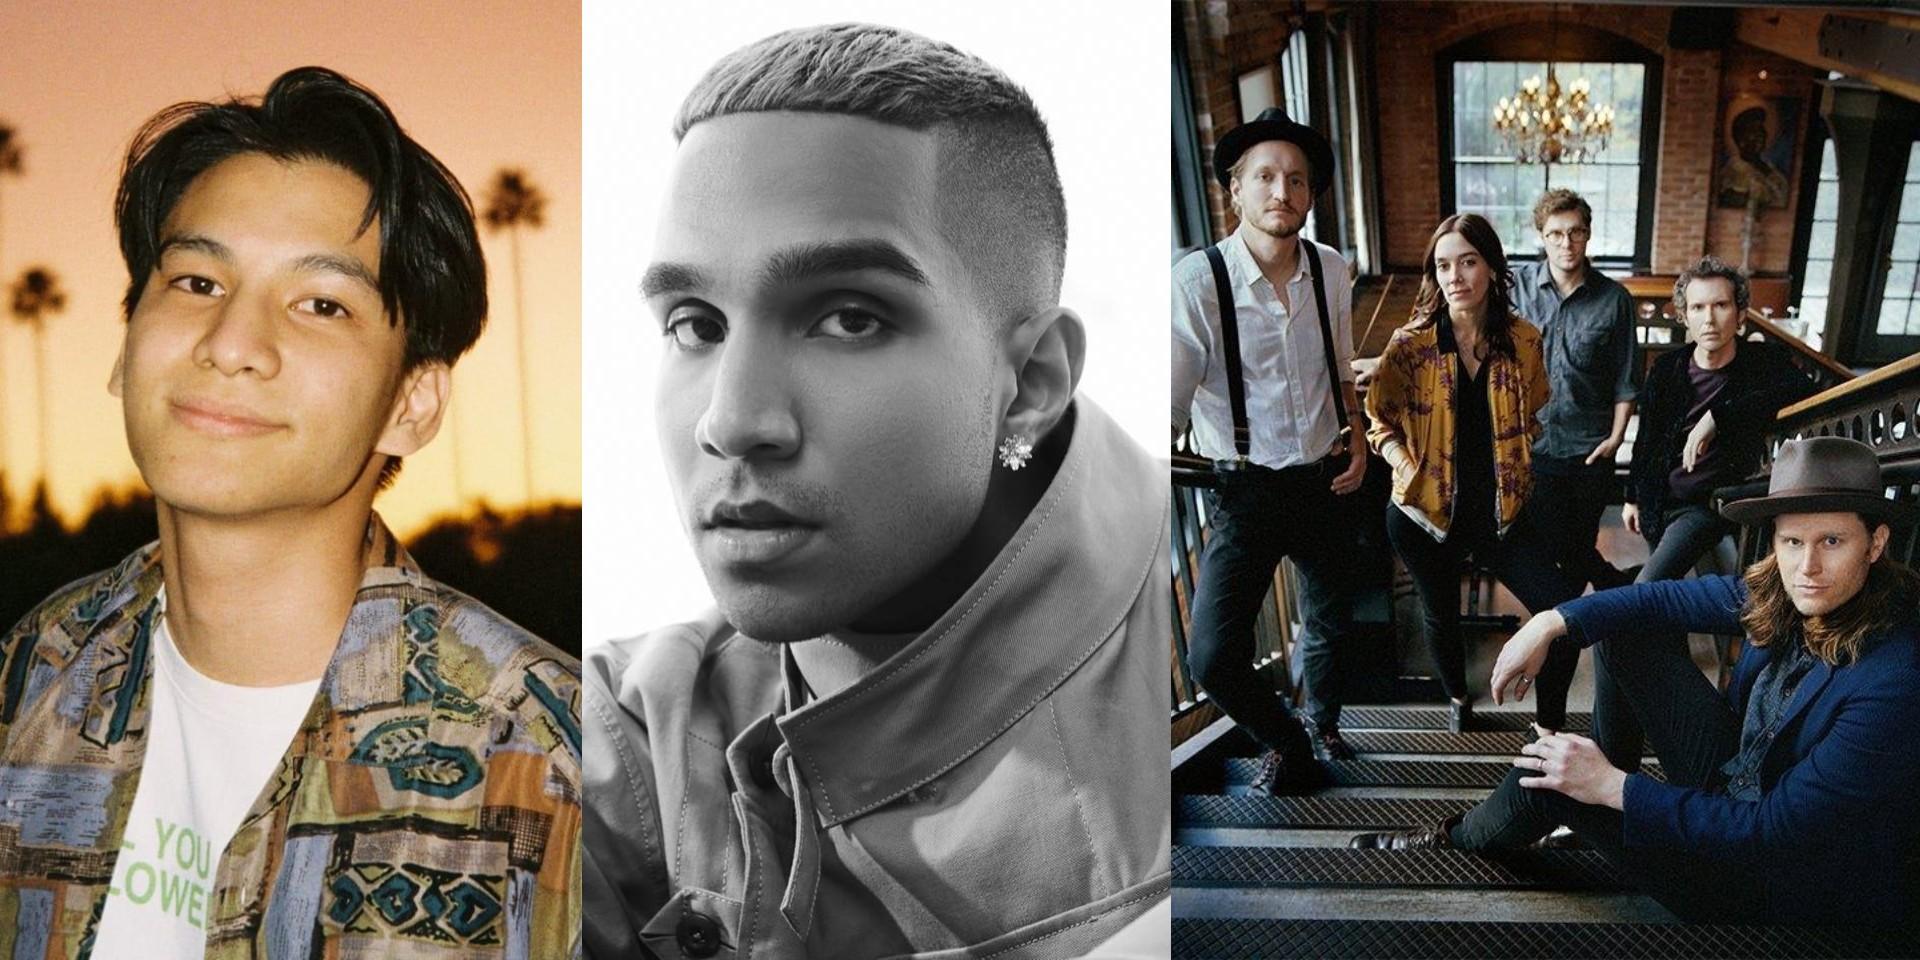 Bacardi NH7 Weekender 2020 lineup revealed – Phum Viphurit, Yung Raja, The Lumineers, and more